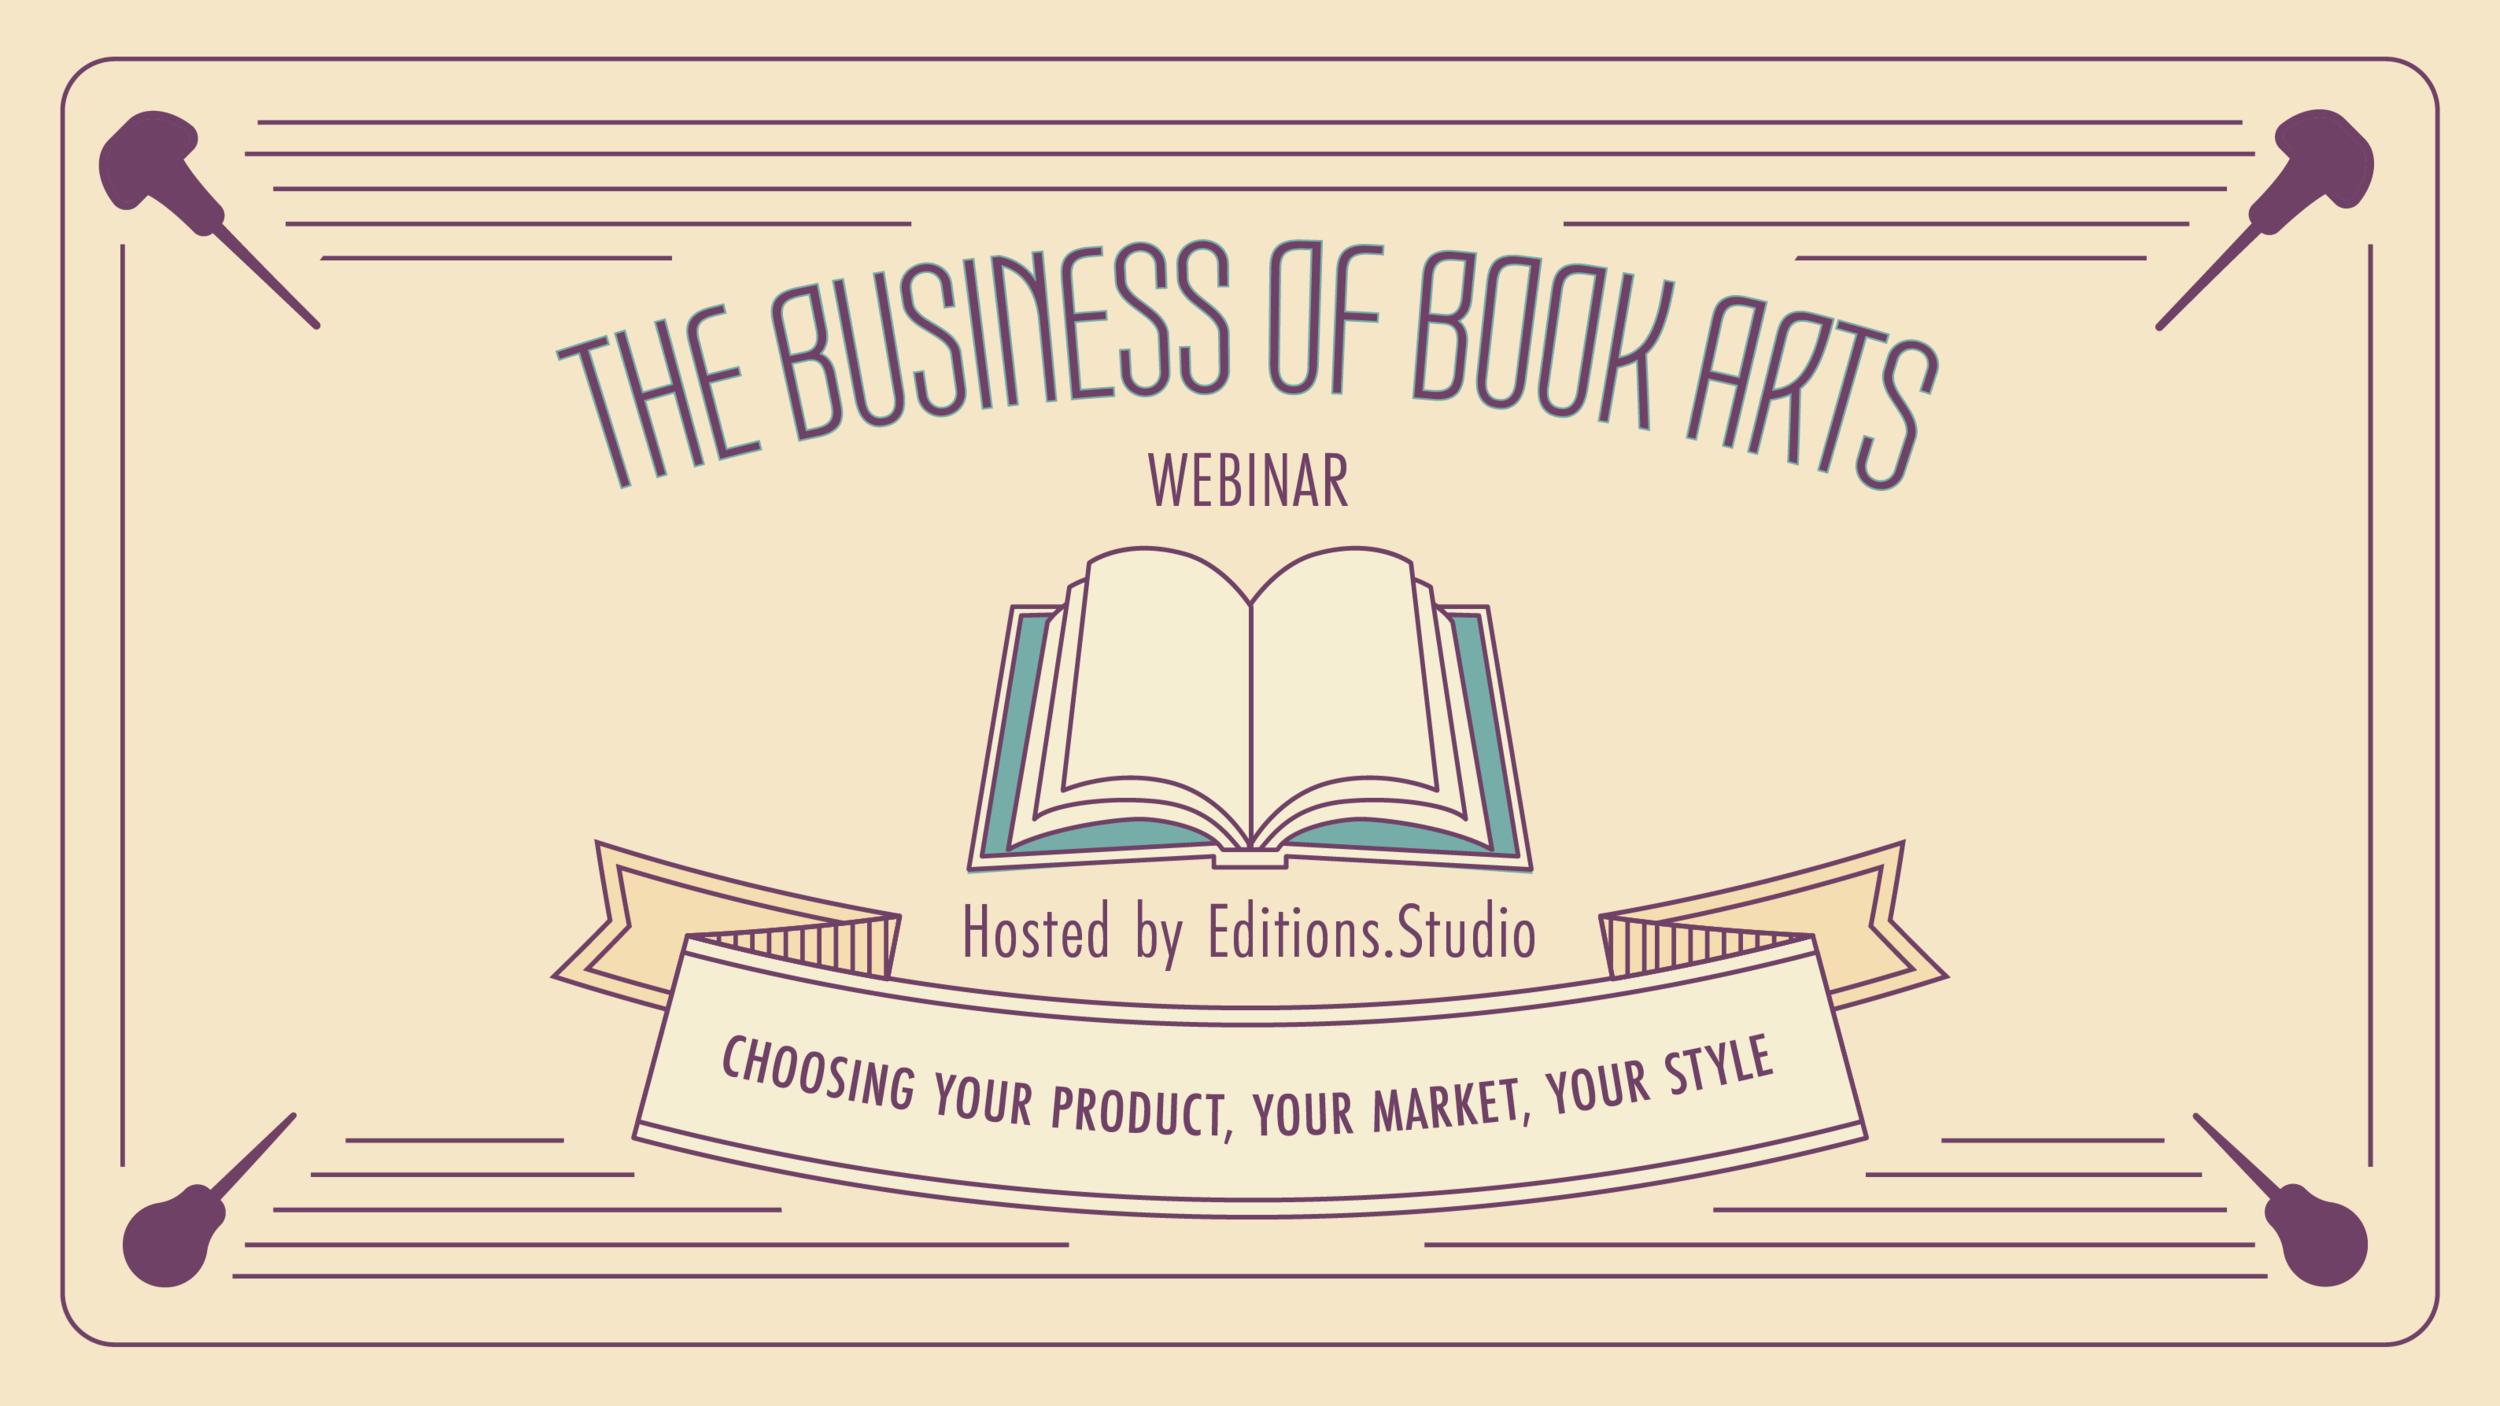 business of book arts webinar wide.png